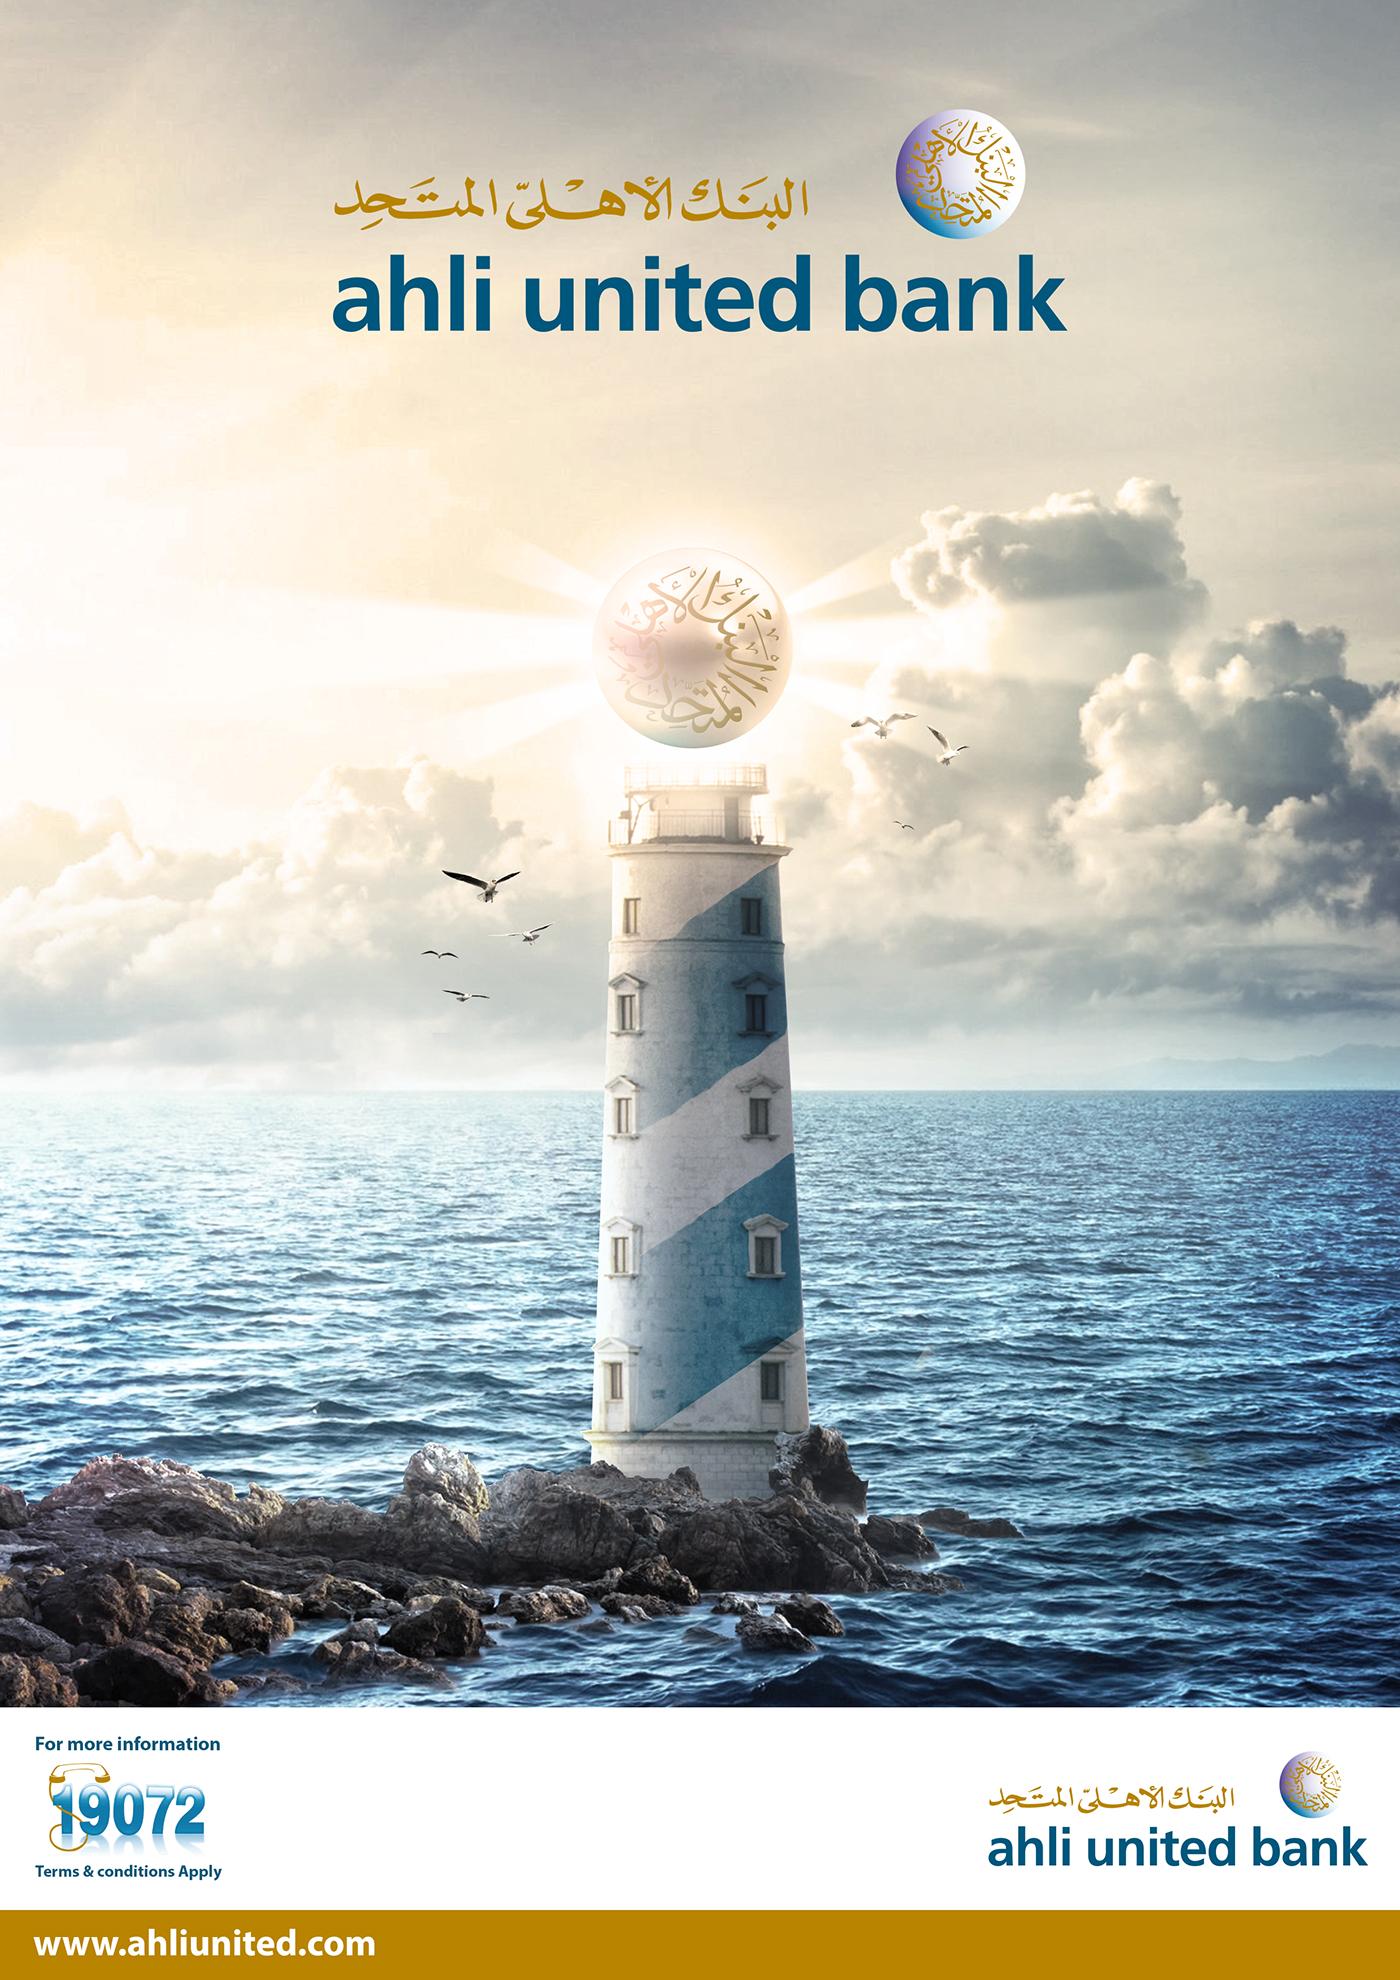 creative visual Bank Brandinc brandinc. master visual lighthouse light SKY clouds birds future Photo Composting tutorial beacon